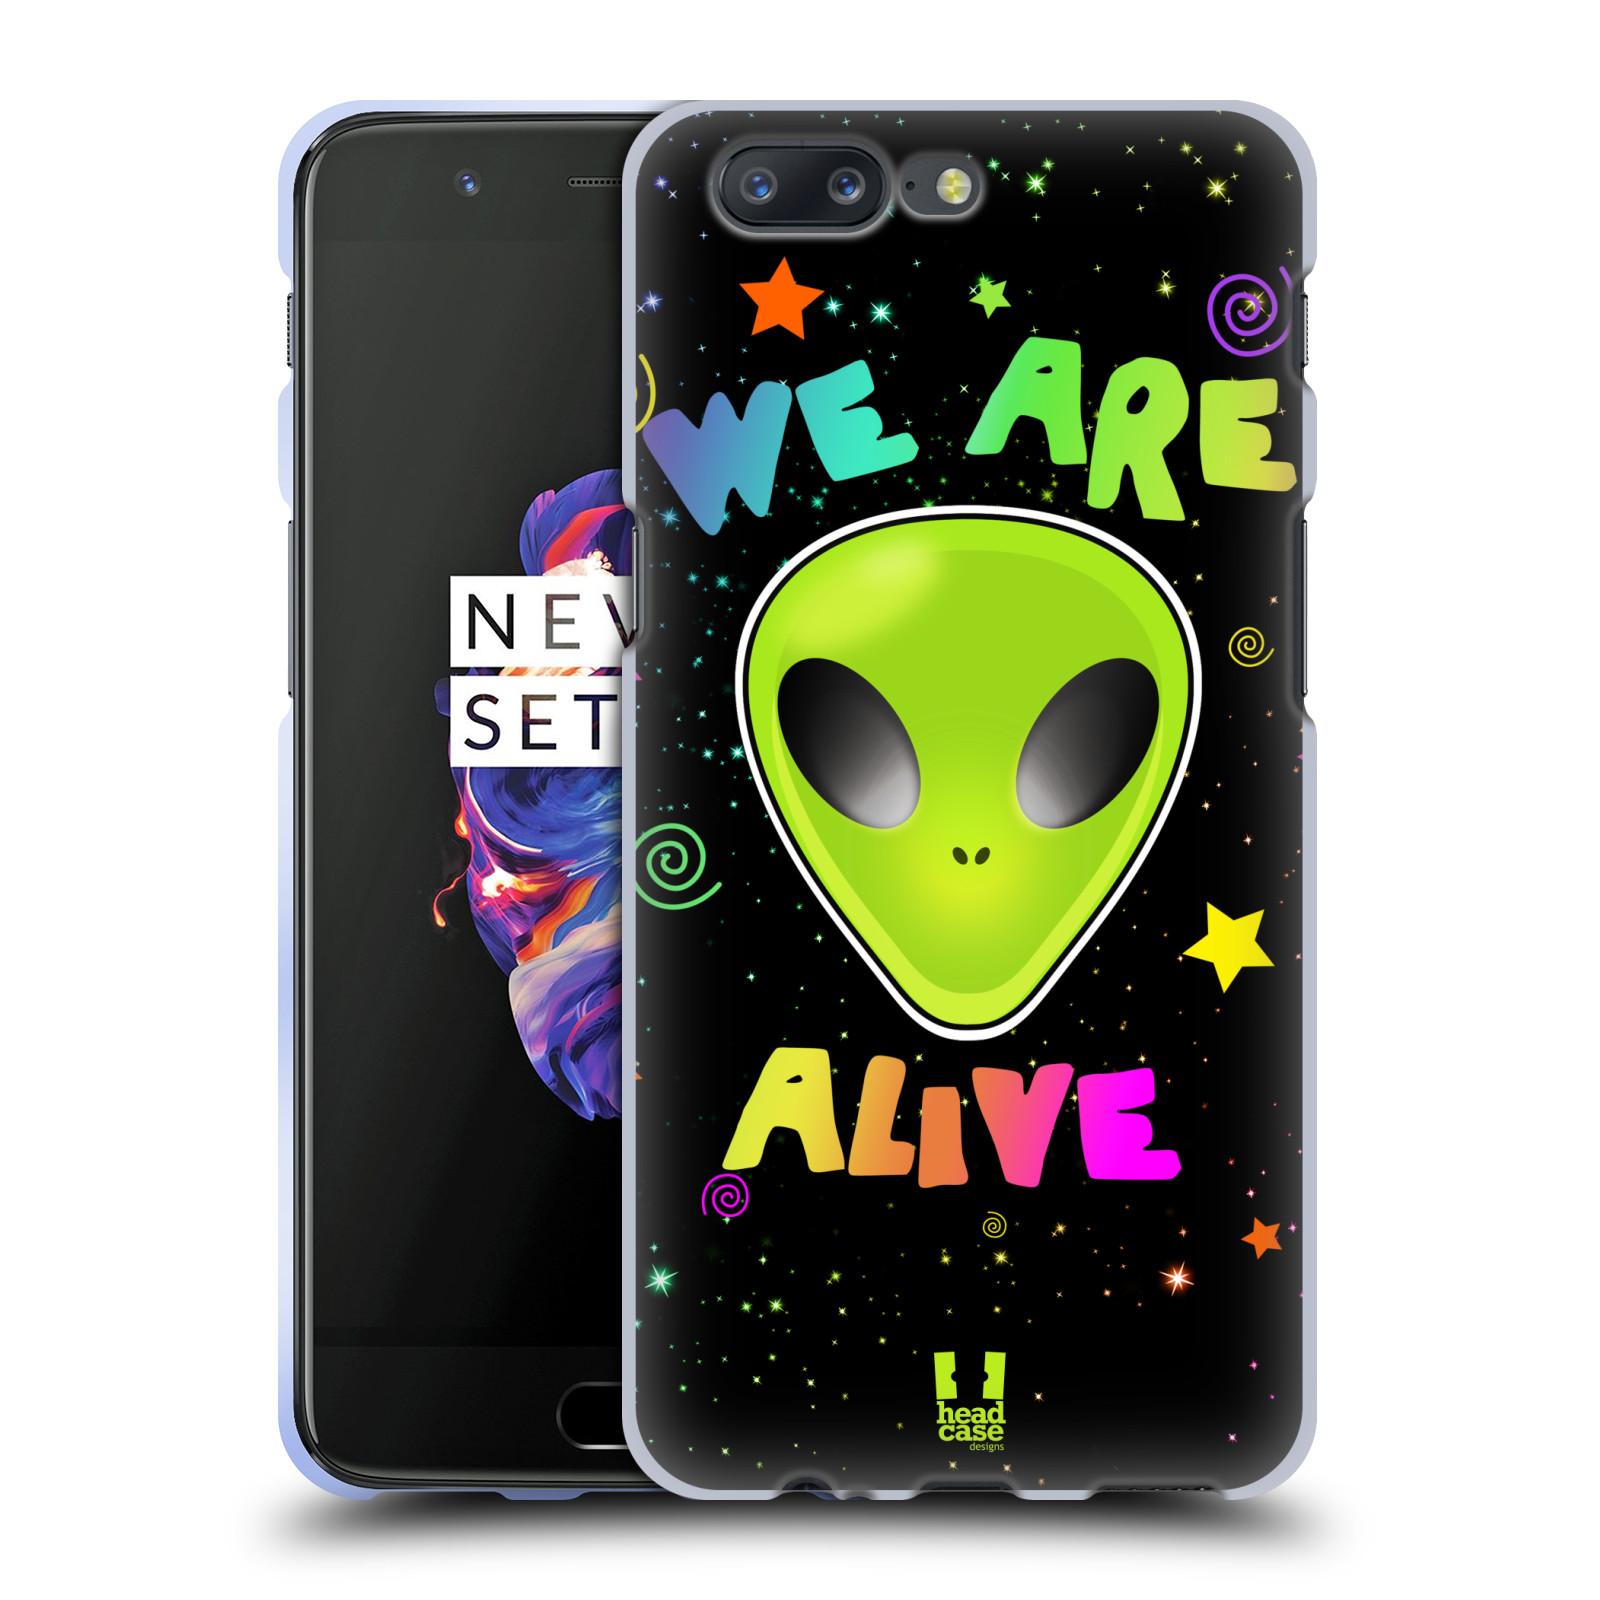 Silikonové pouzdro na mobil OnePlus 5 - Head Case - ALIENS ALIVE